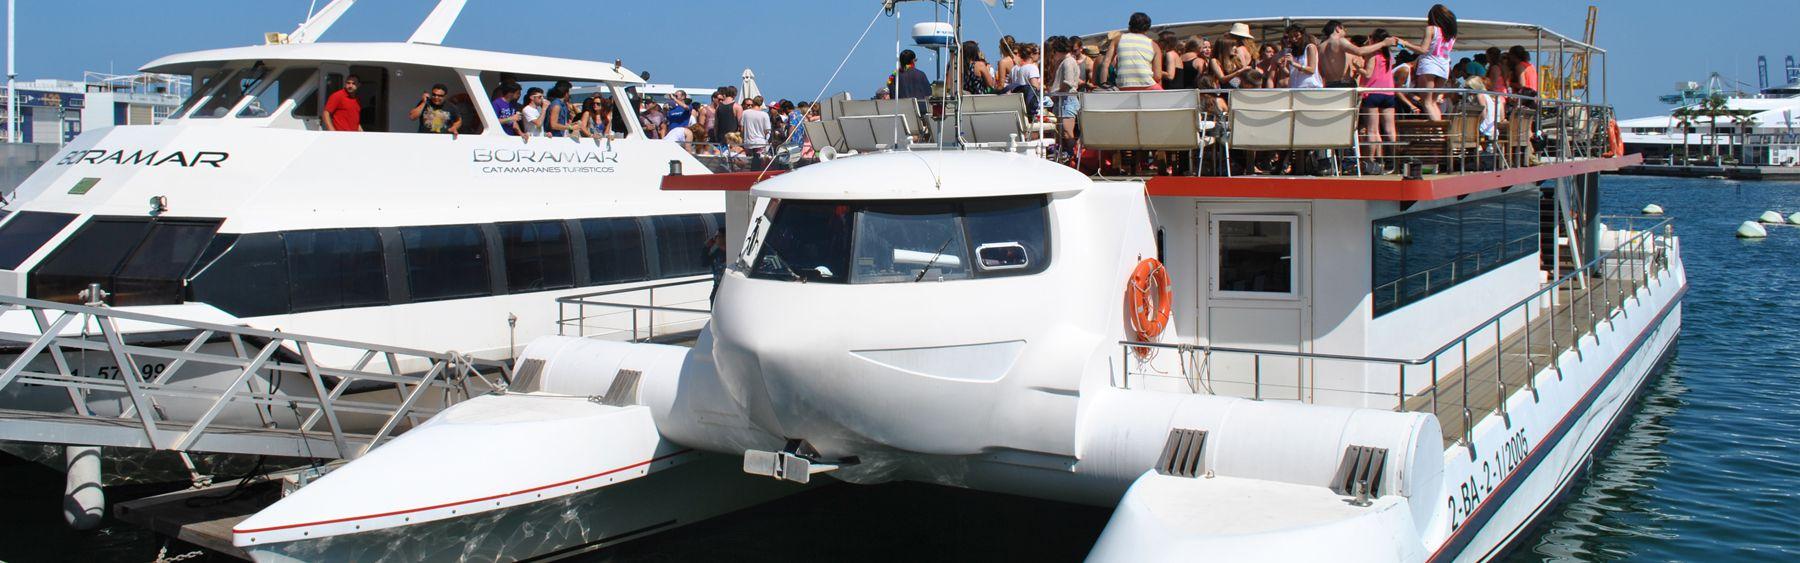 catamaranes-boramar